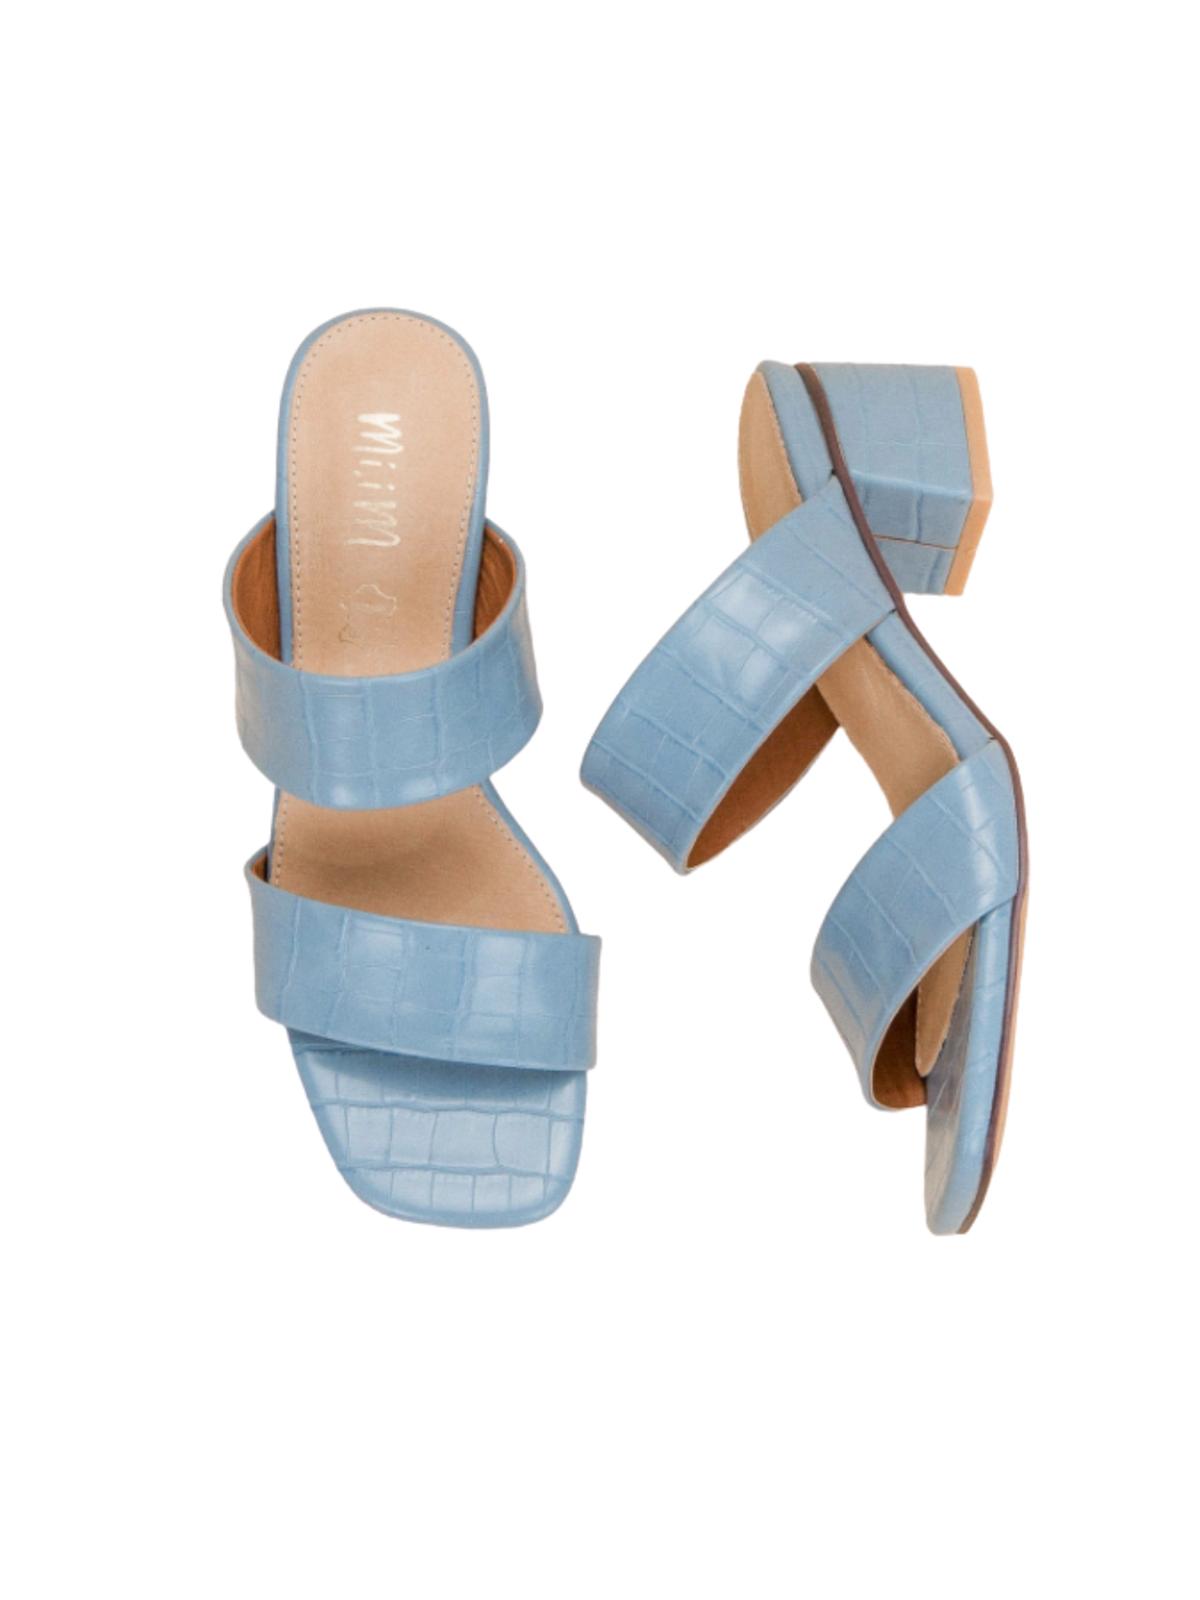 Blue sandals, Powder blue